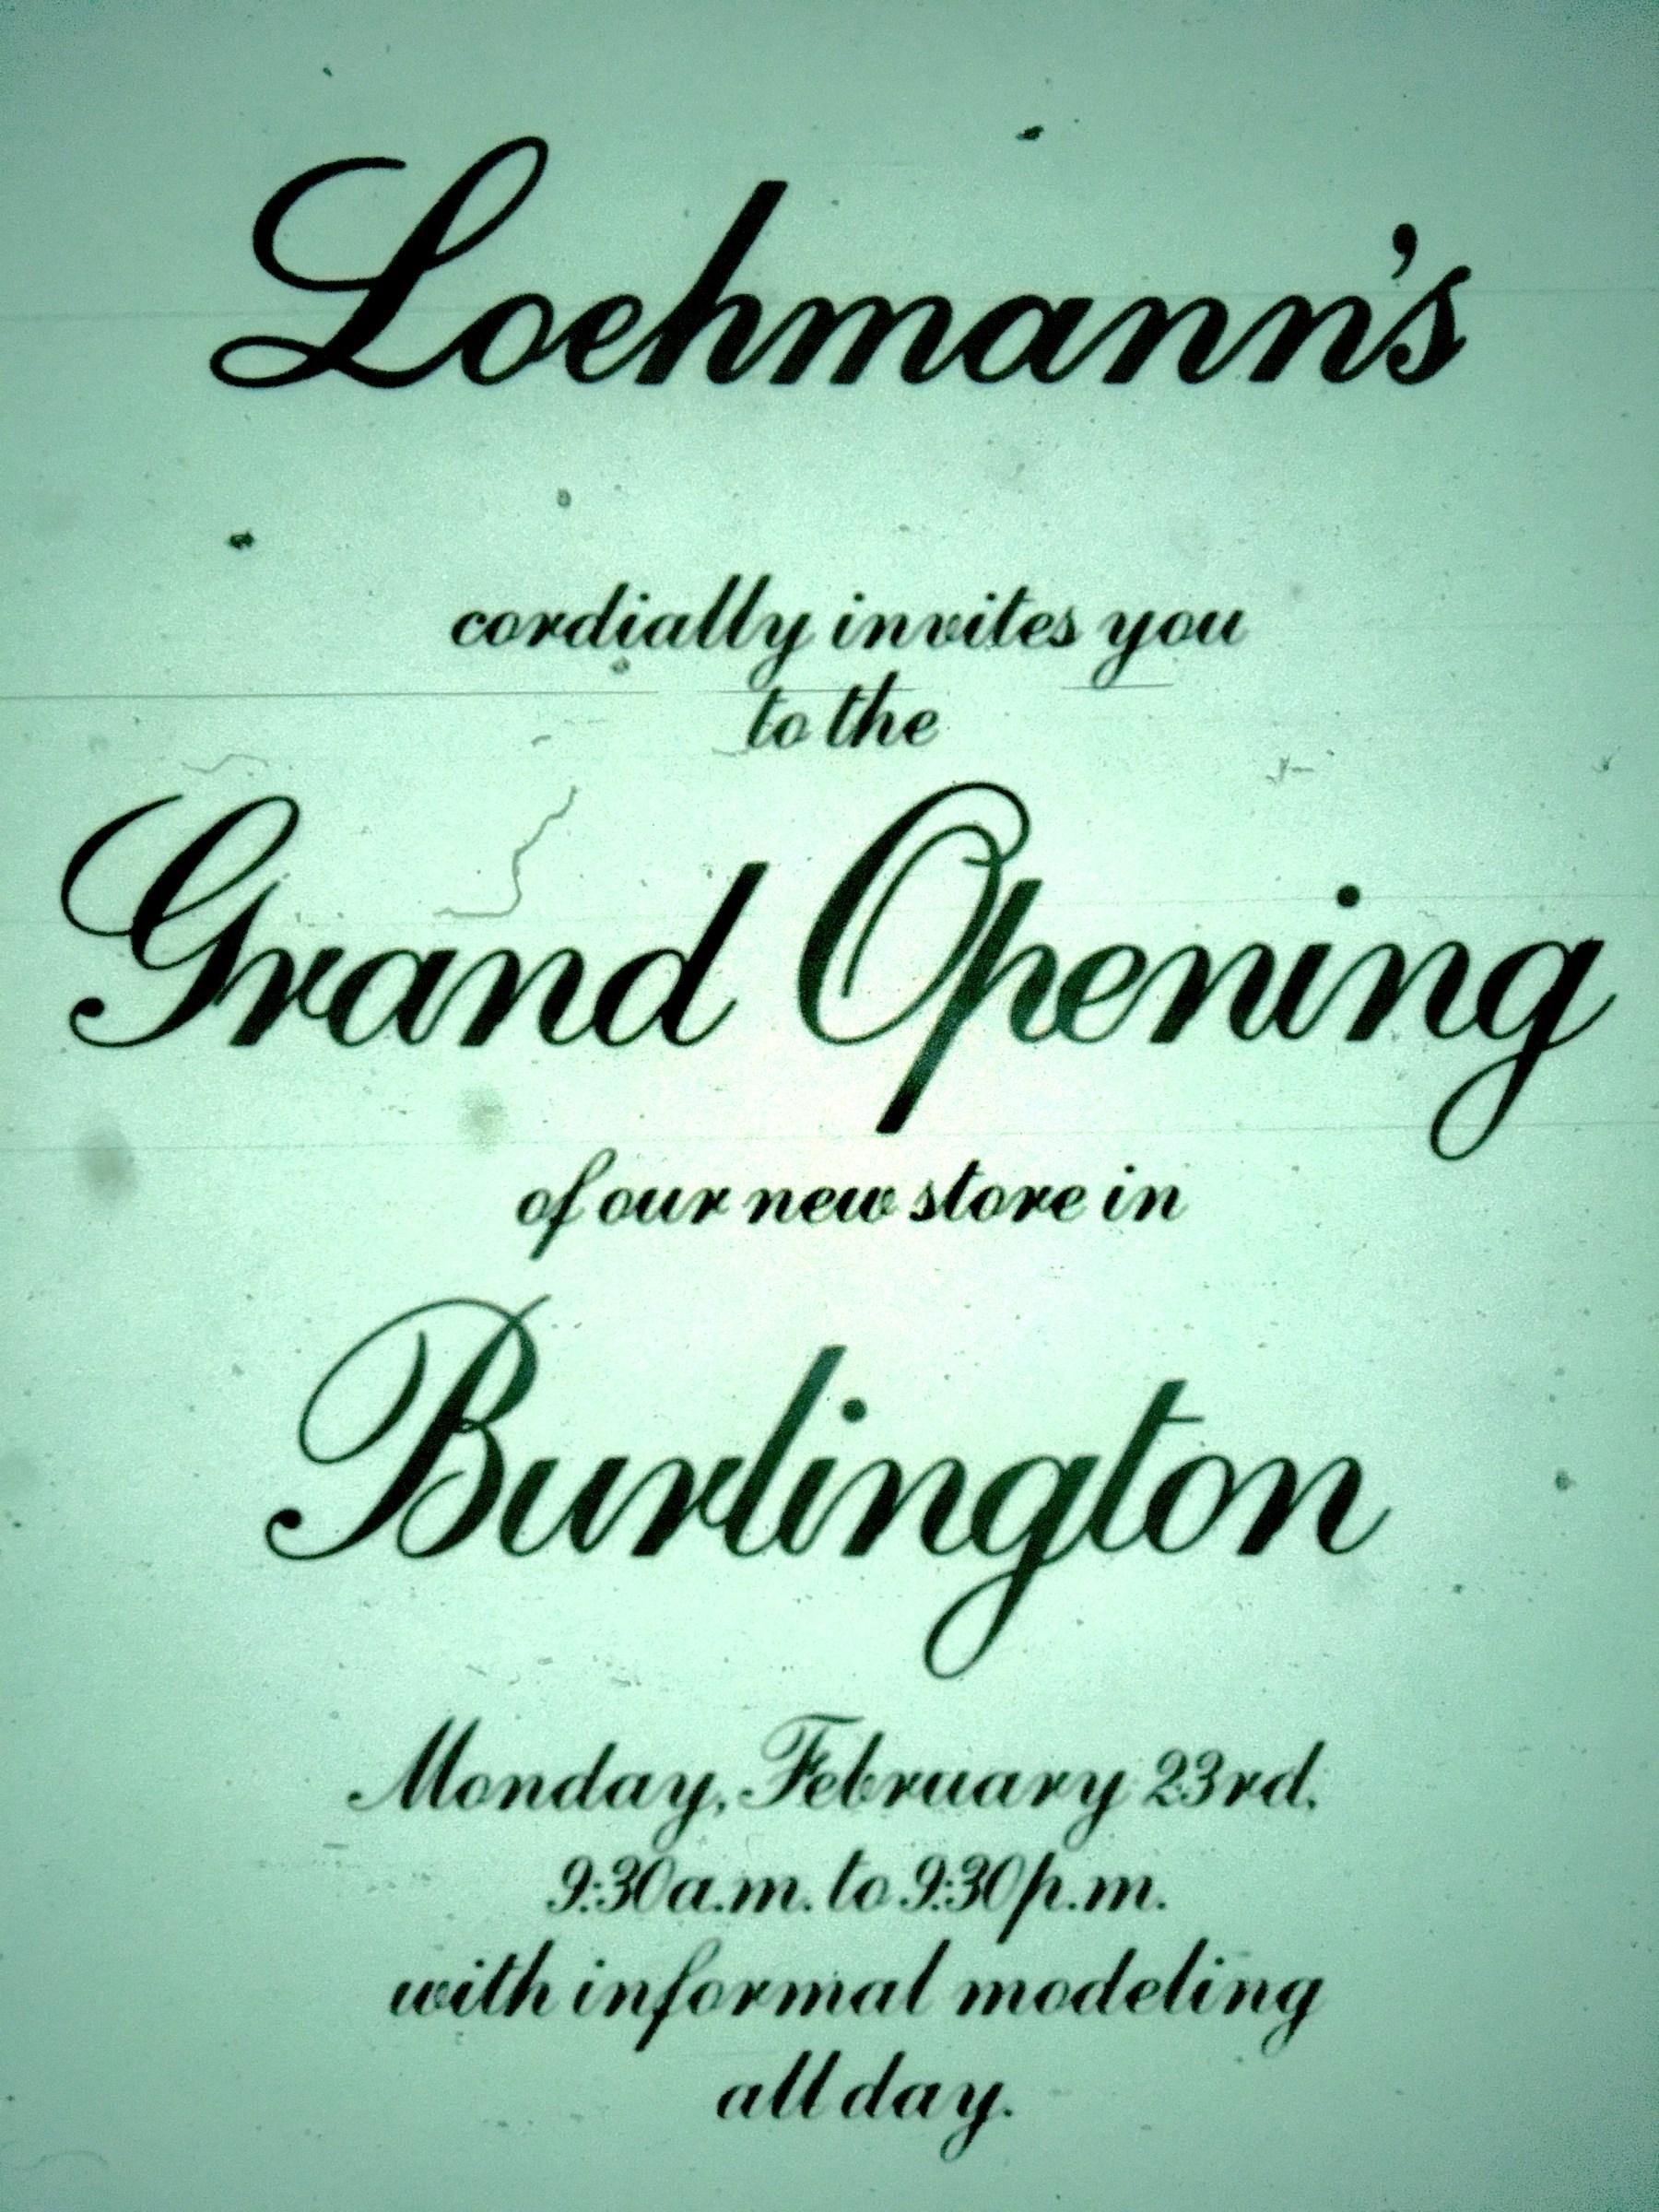 Loehmann's Burlington grand opening